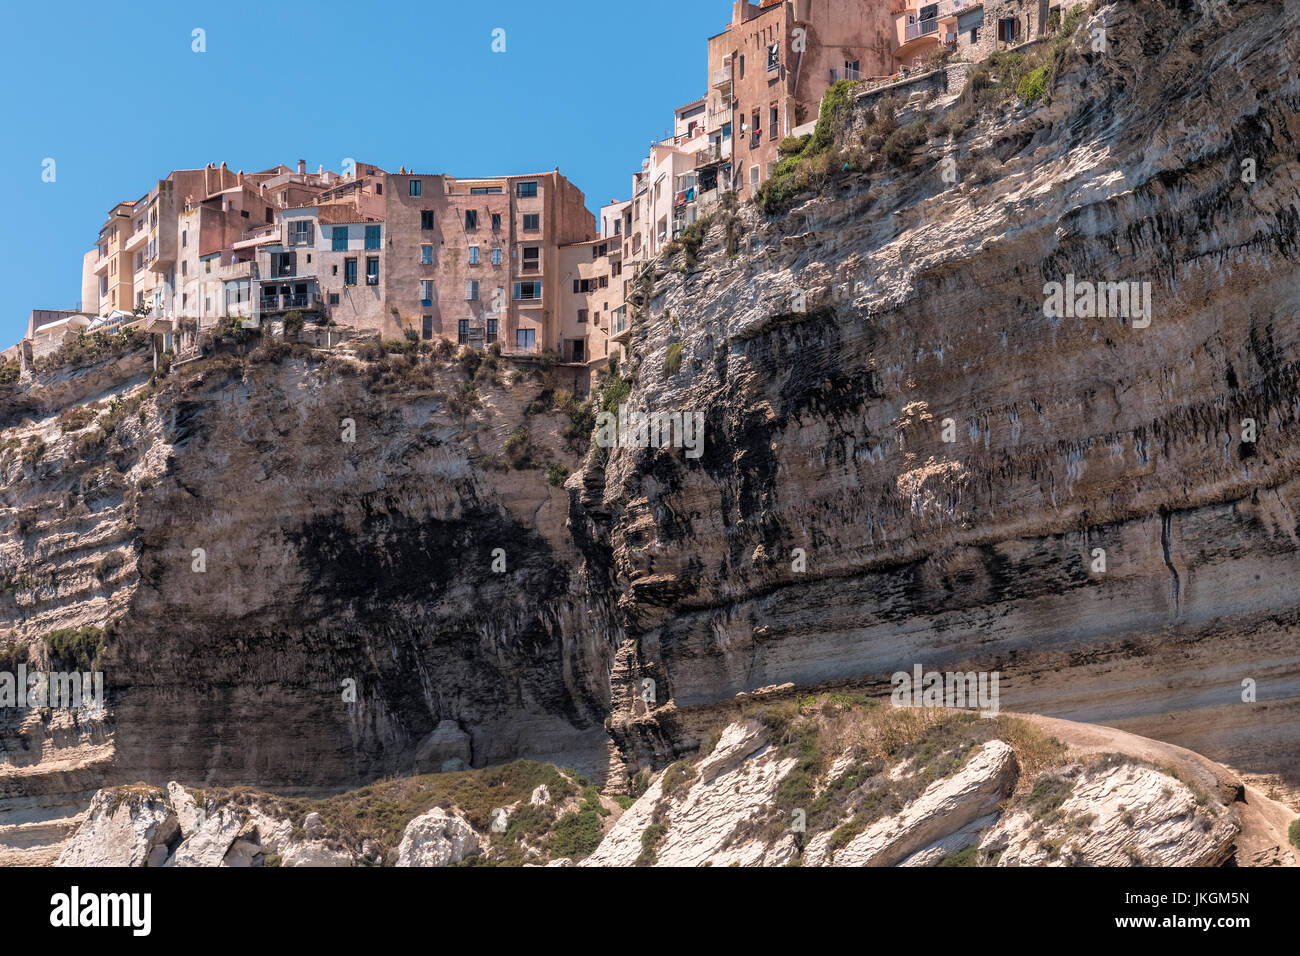 Ville Haute, Bonifacio, Corsica, France Stock Photo